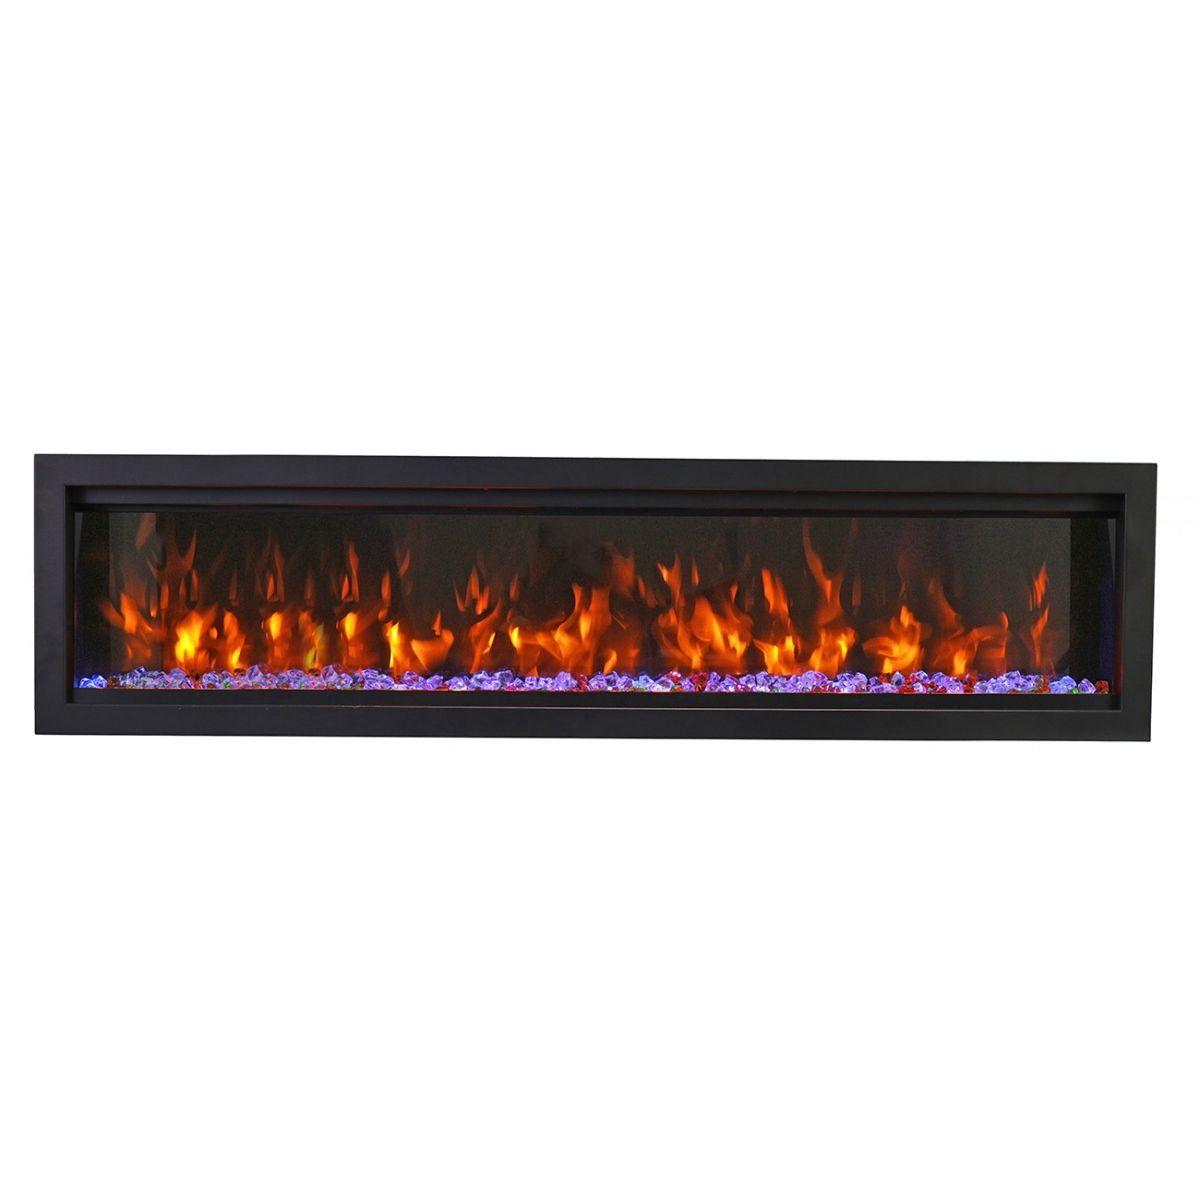 Amantii SYM-74 BESPOKE Symmetry Bespoke Electric Fireplace